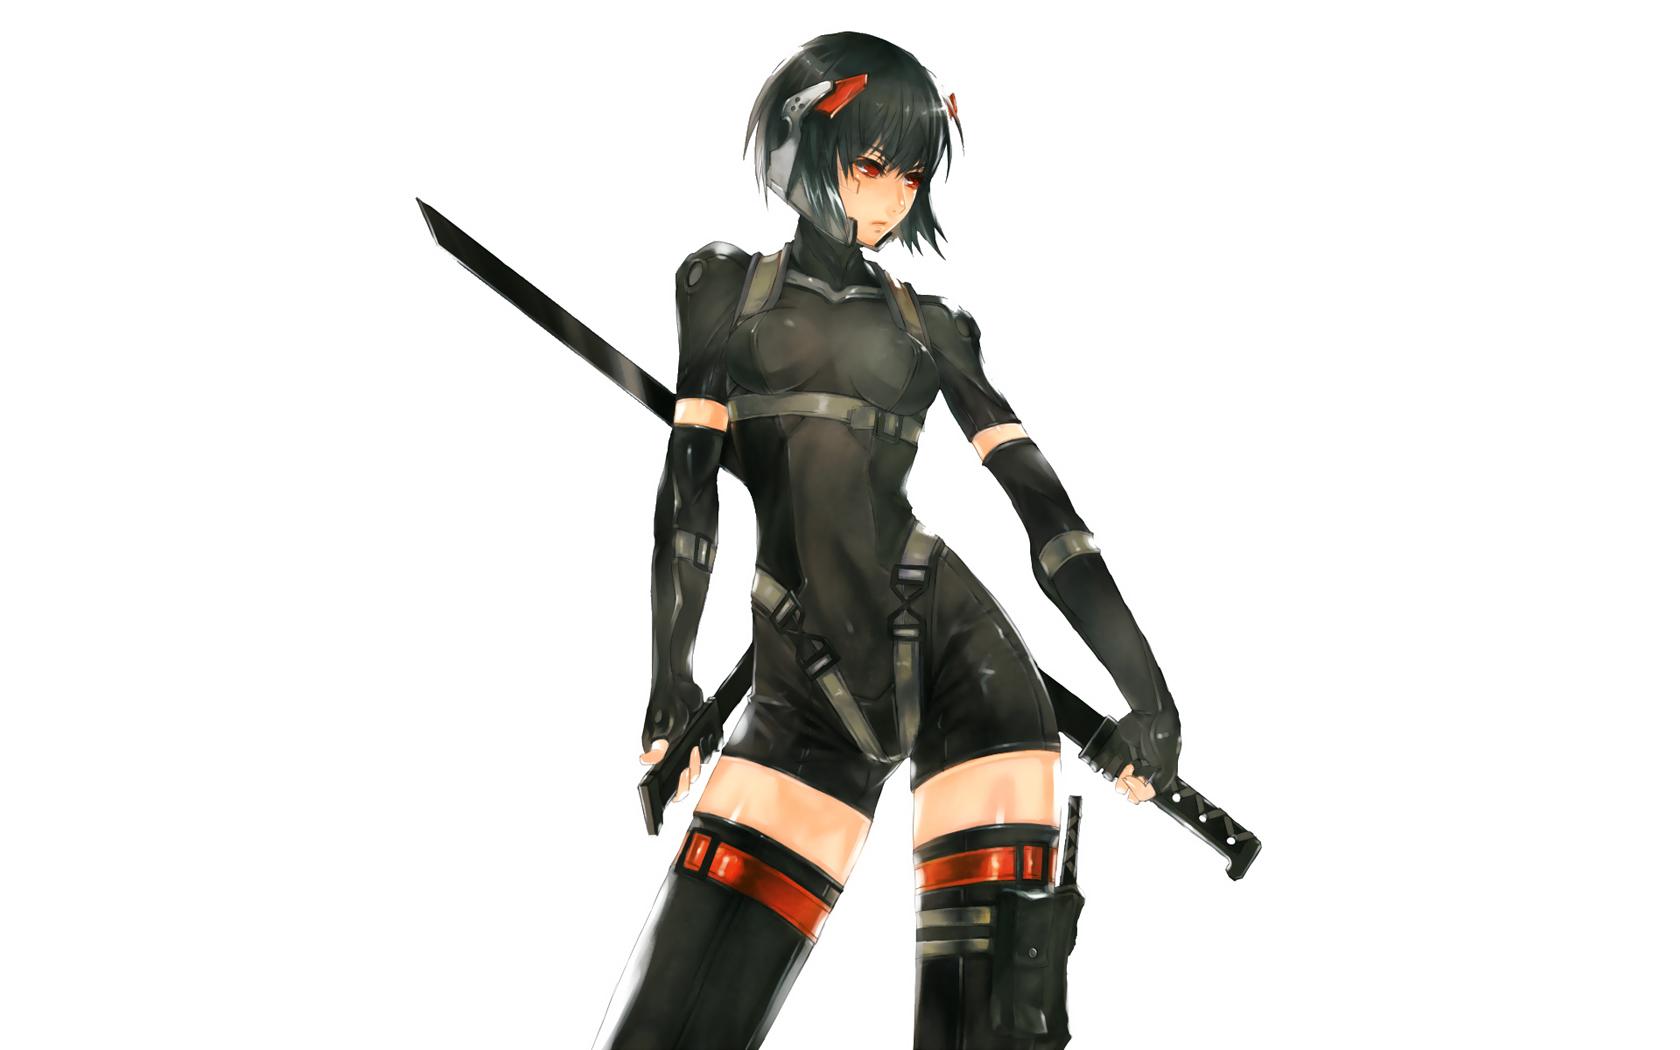 black_hair ghost_in_the_shell kusanagi_motoko metal_gear nidy-2d- parody red_eyes sword thighhighs weapon white zettai_ryouiki